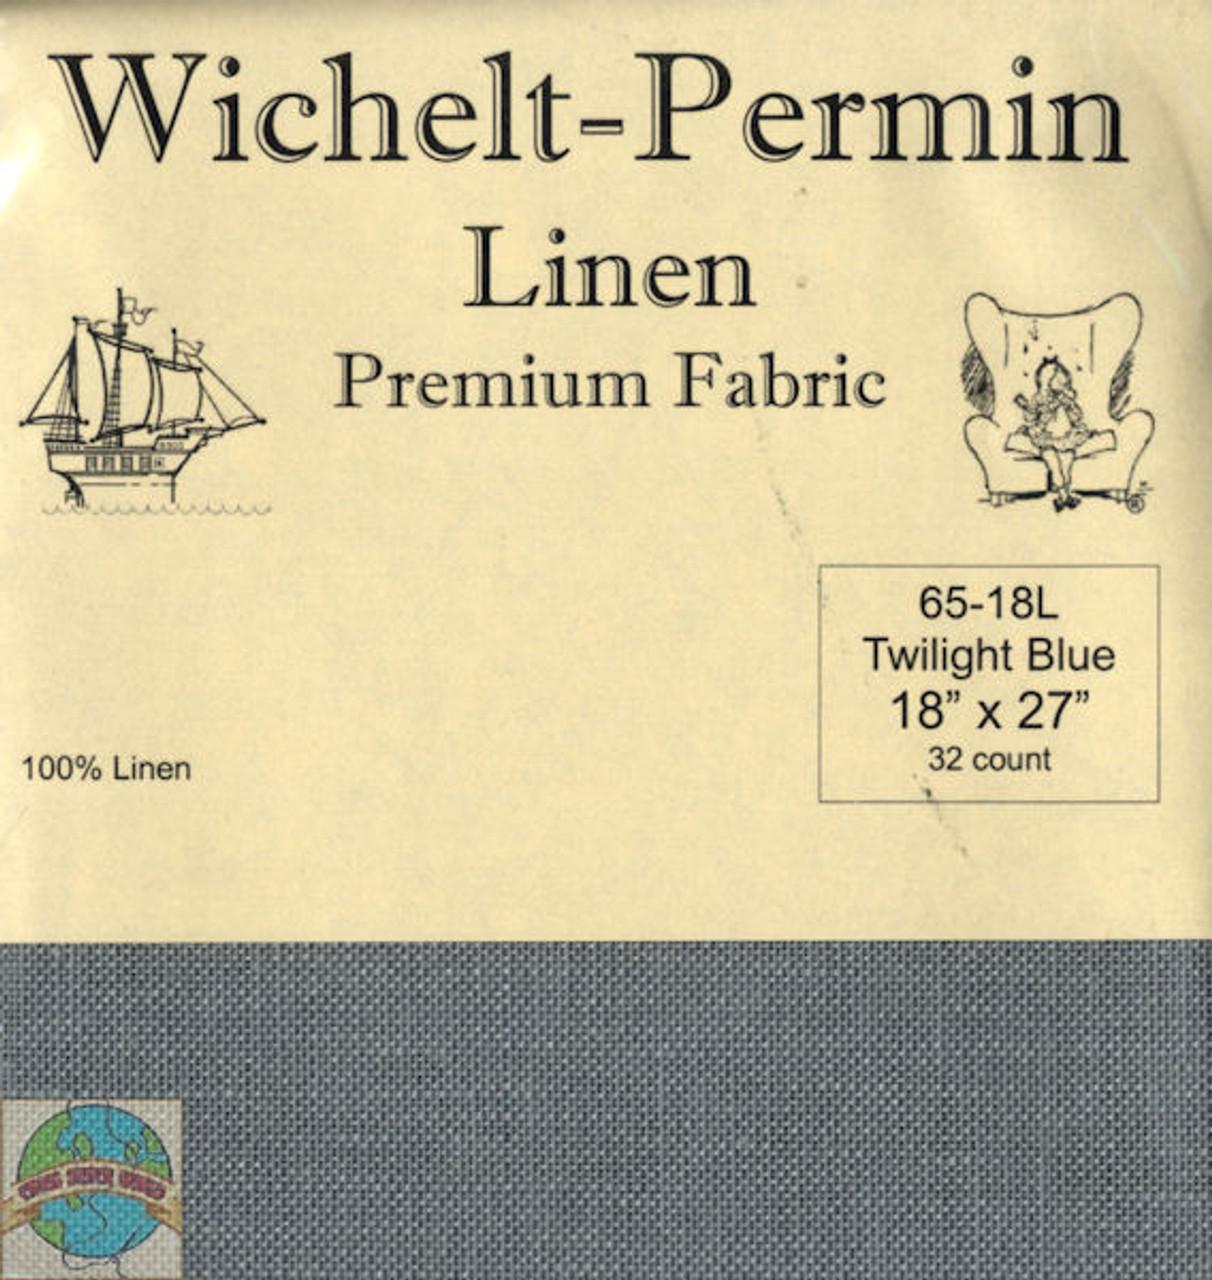 Wichelt - 32 Ct Twilight Blue Linen 18 x 27 in